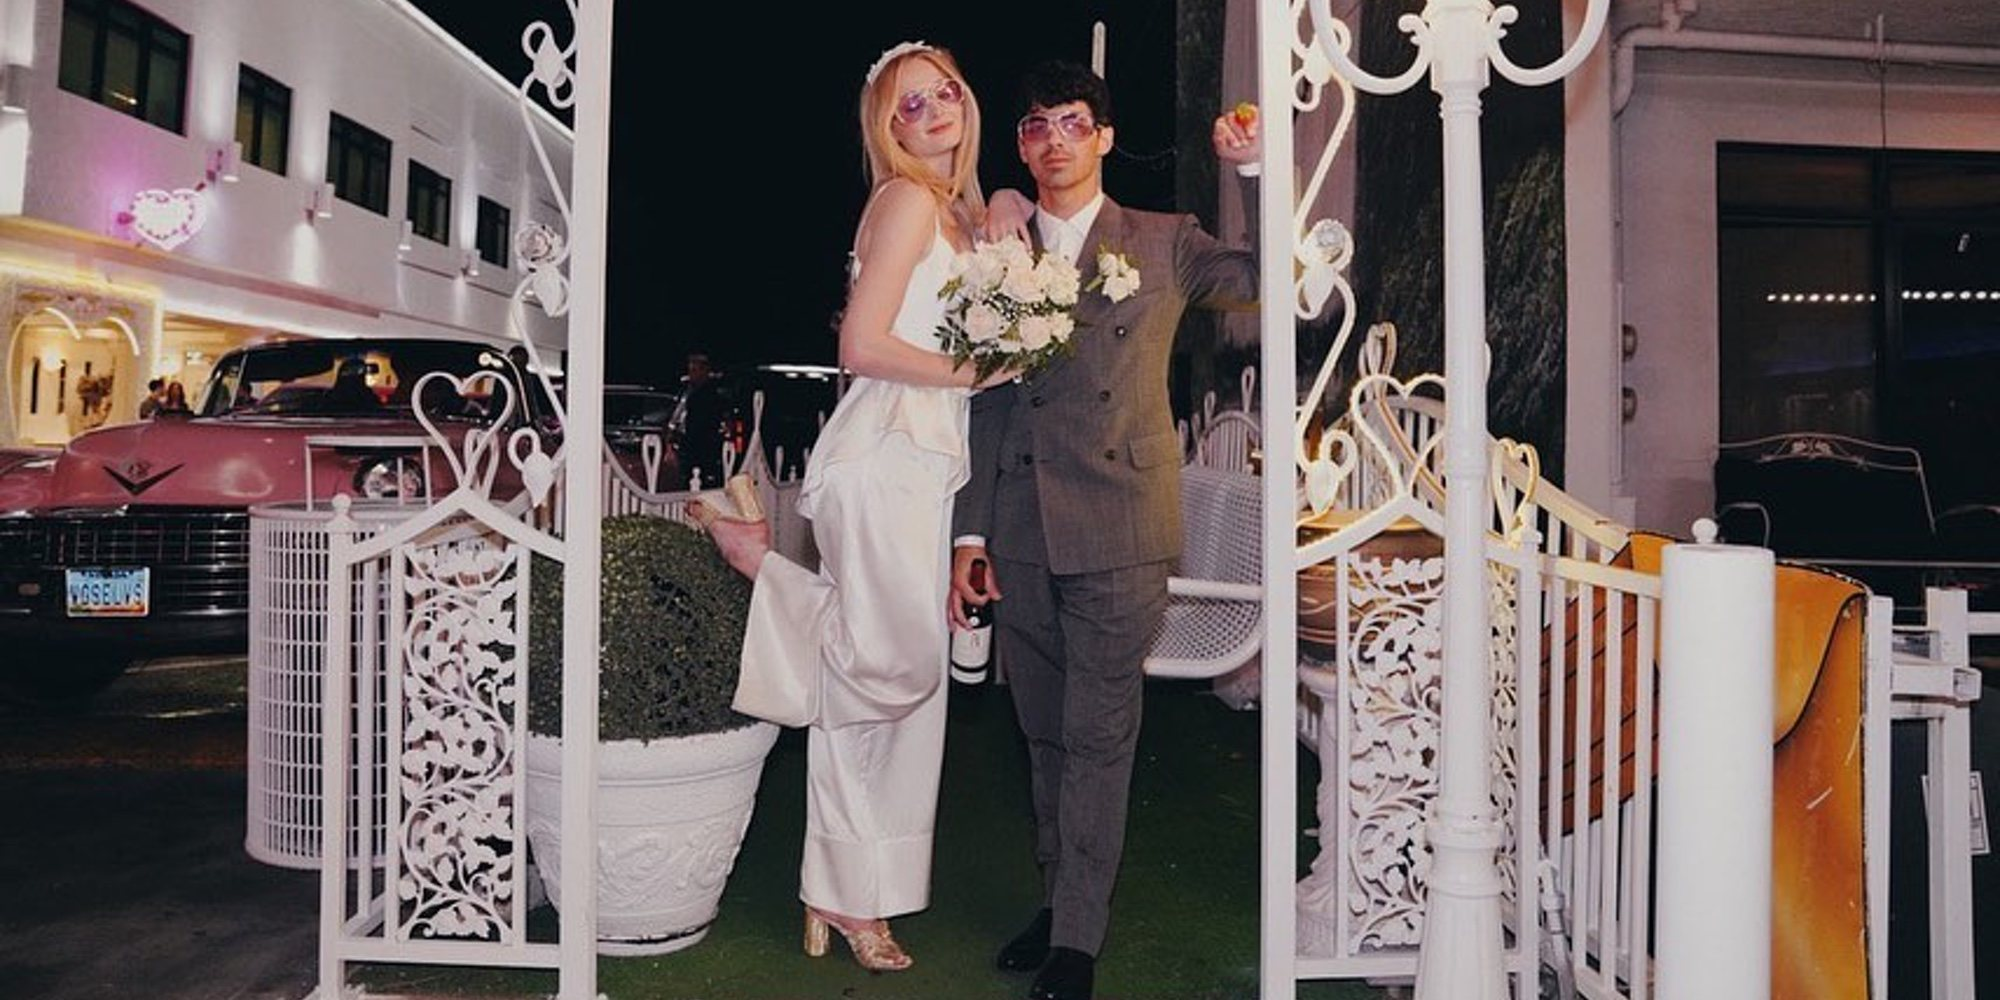 Joe Jonas y Sophie Turner celebran su segundo aniversario con fotos inéditas de la boda en Las Vegas